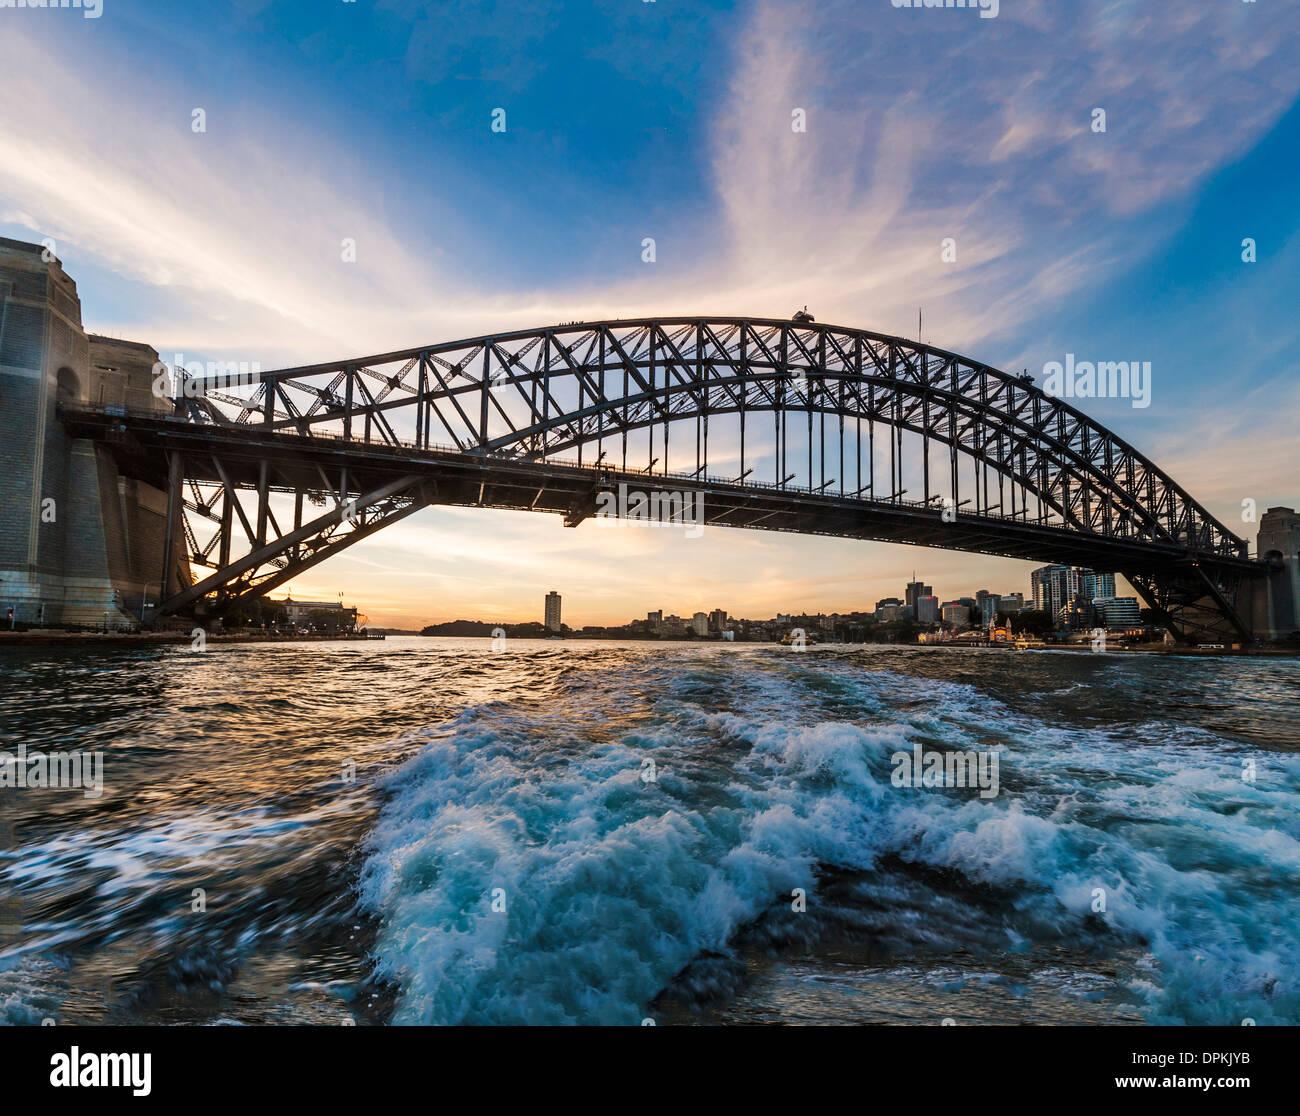 Viaje en el ferry del puerto de Sydney, Sydney Harbour Bridge at Sunset, Sydney, Australia Imagen De Stock